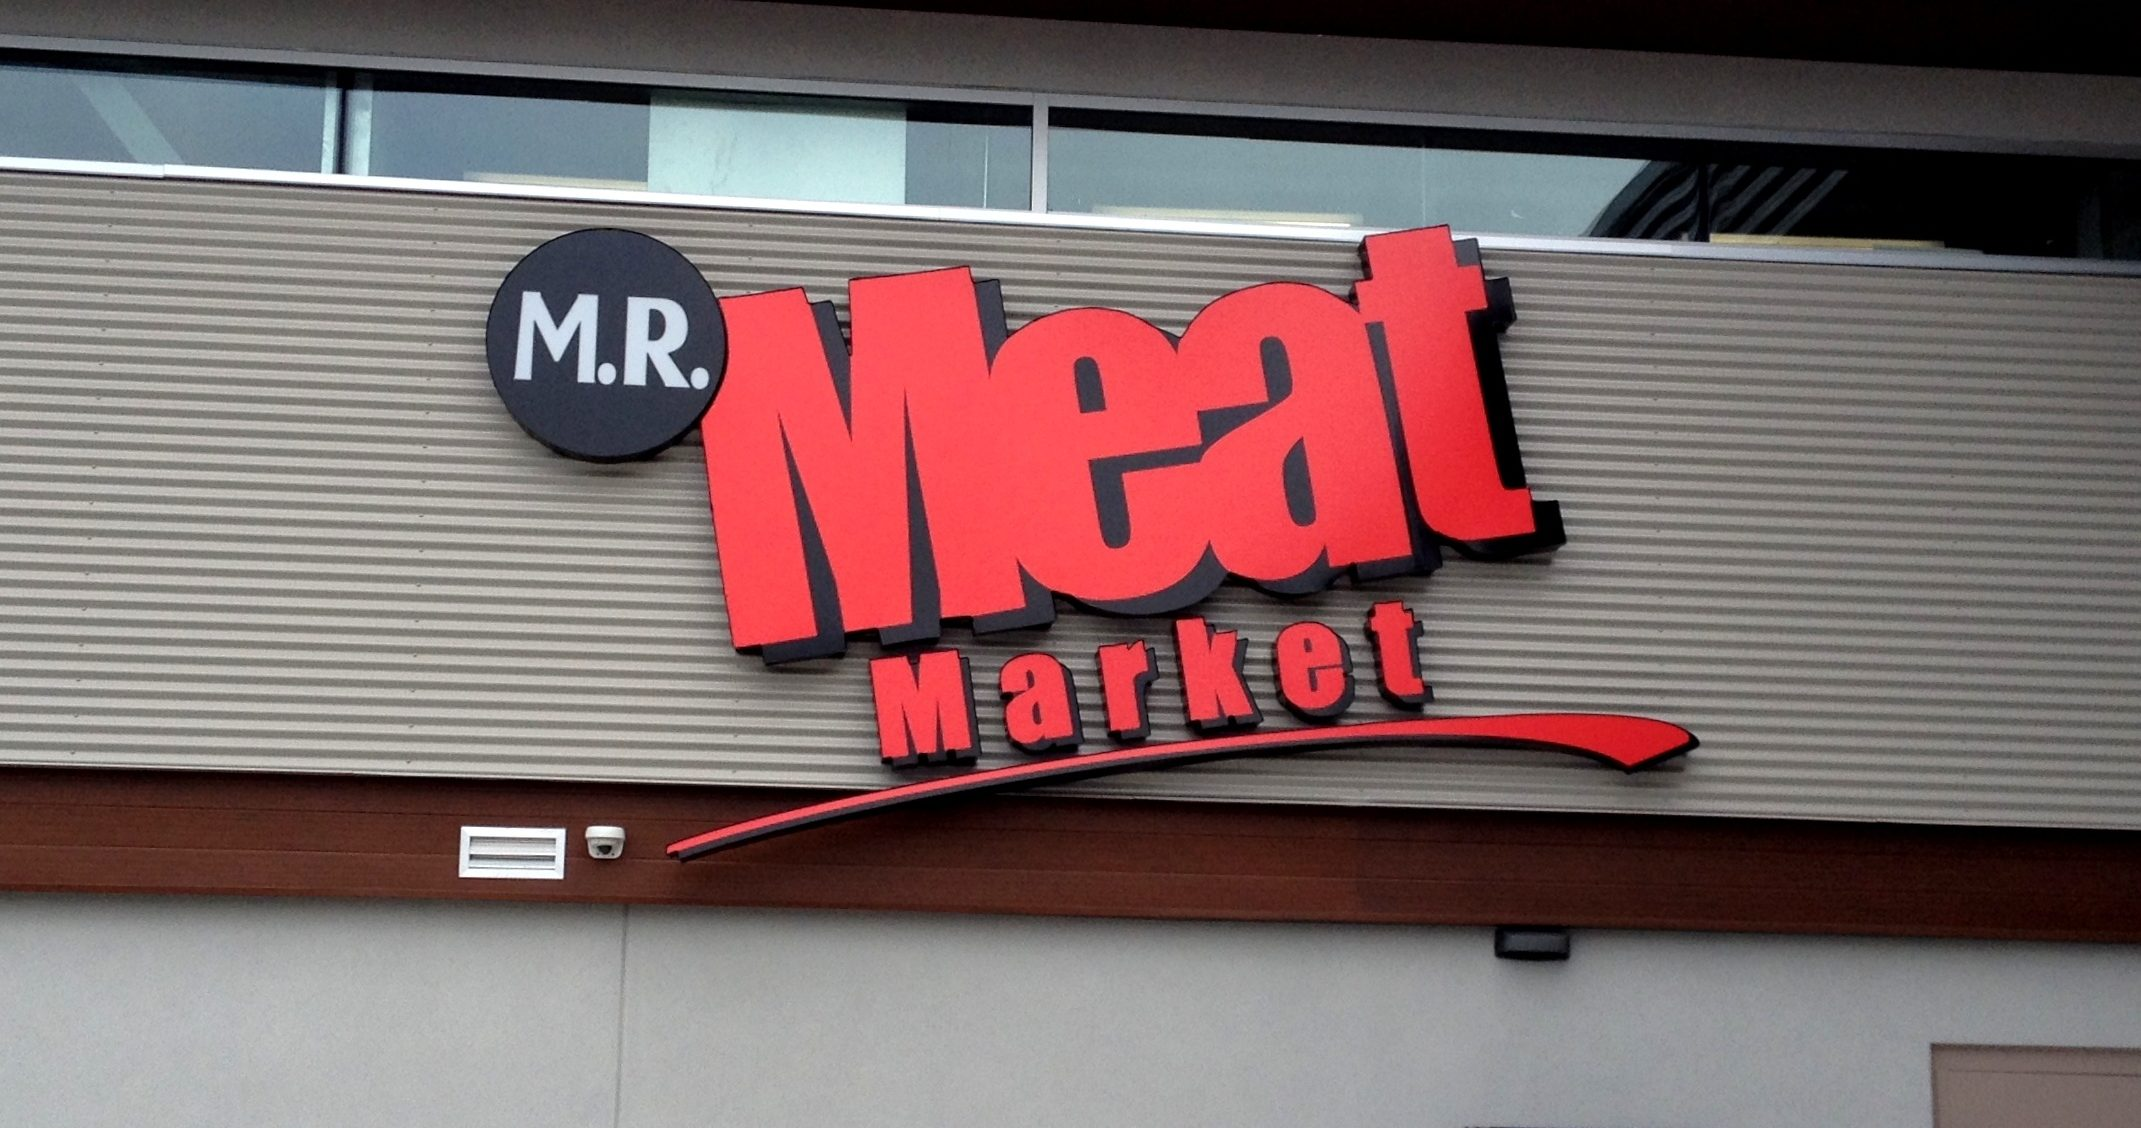 MRMeats1 - Edit